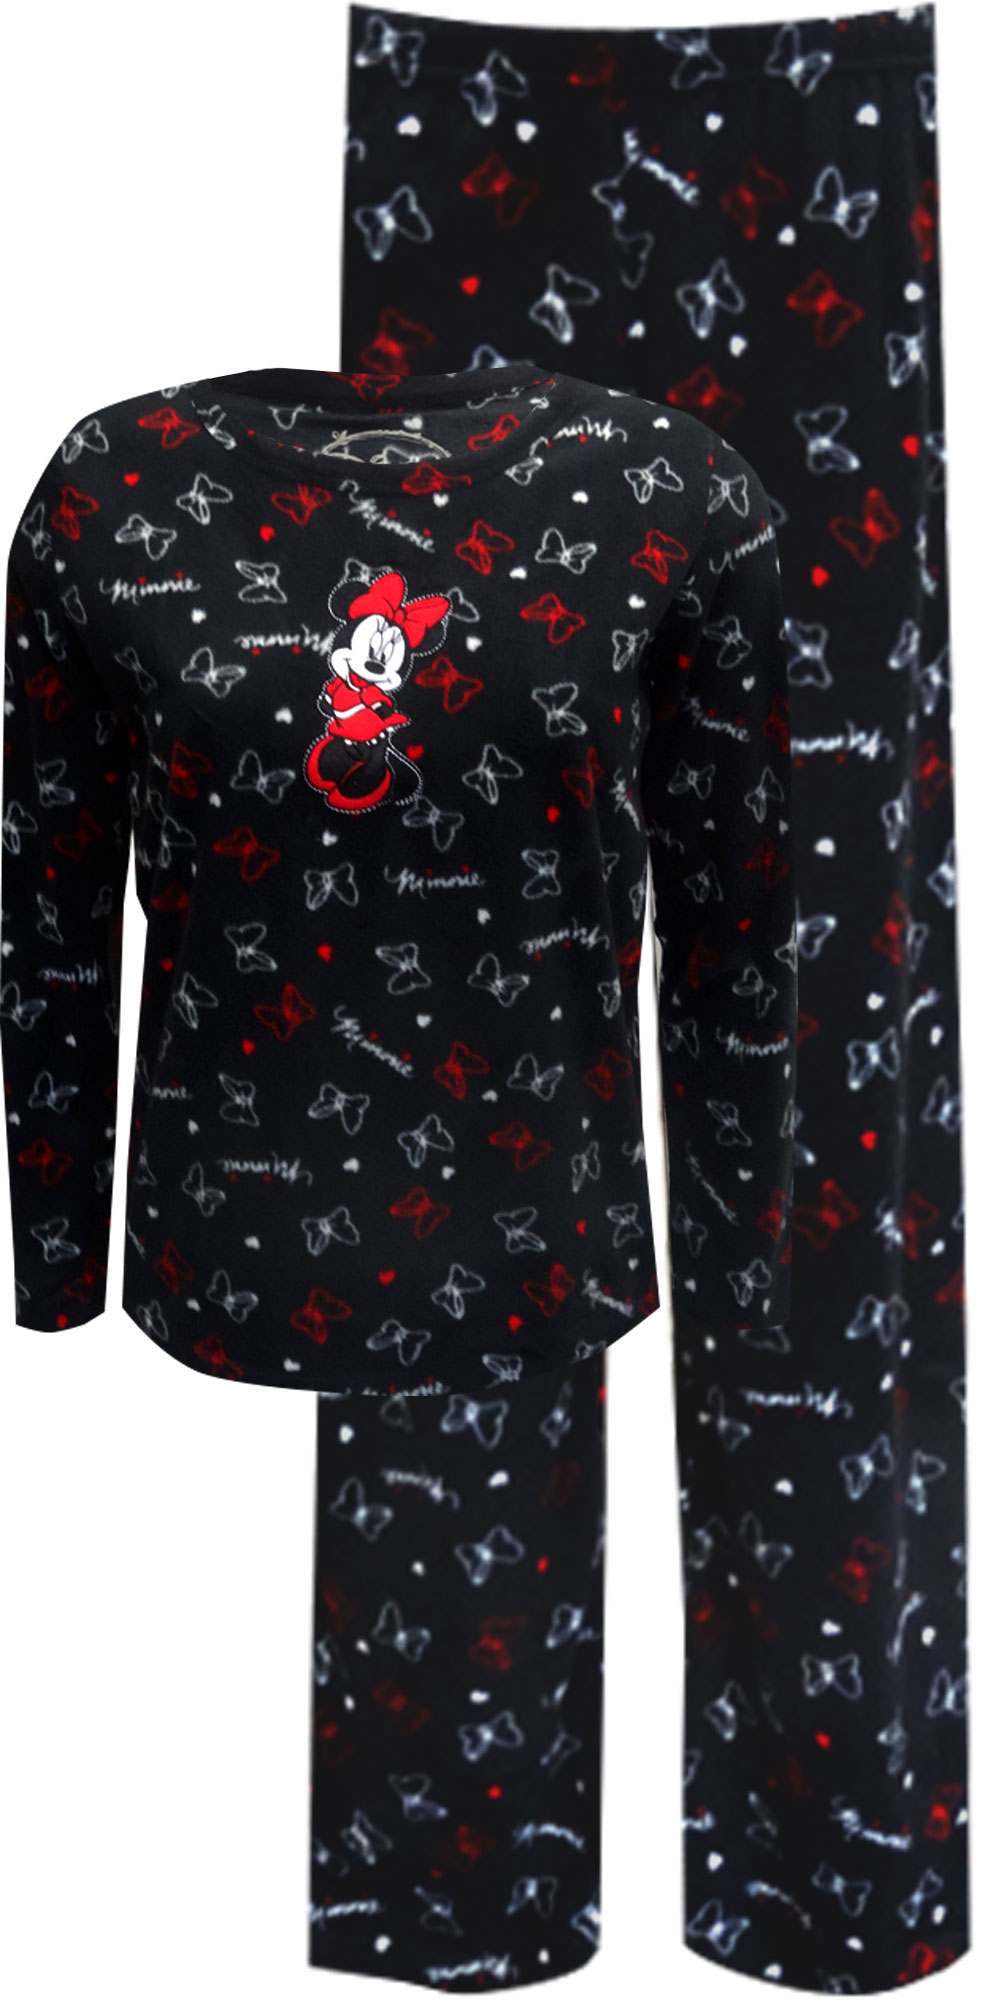 Find great deals on Womens Pajama Sets at Kohl's today! Sponsored Links Women's Croft & Barrow® Minky Fleece 3-piece Pajama Set + sale. $ Original $ Women's Cuddl Duds Wonderland 3-piece Microfleece Pajama Set + sale. $ Original $